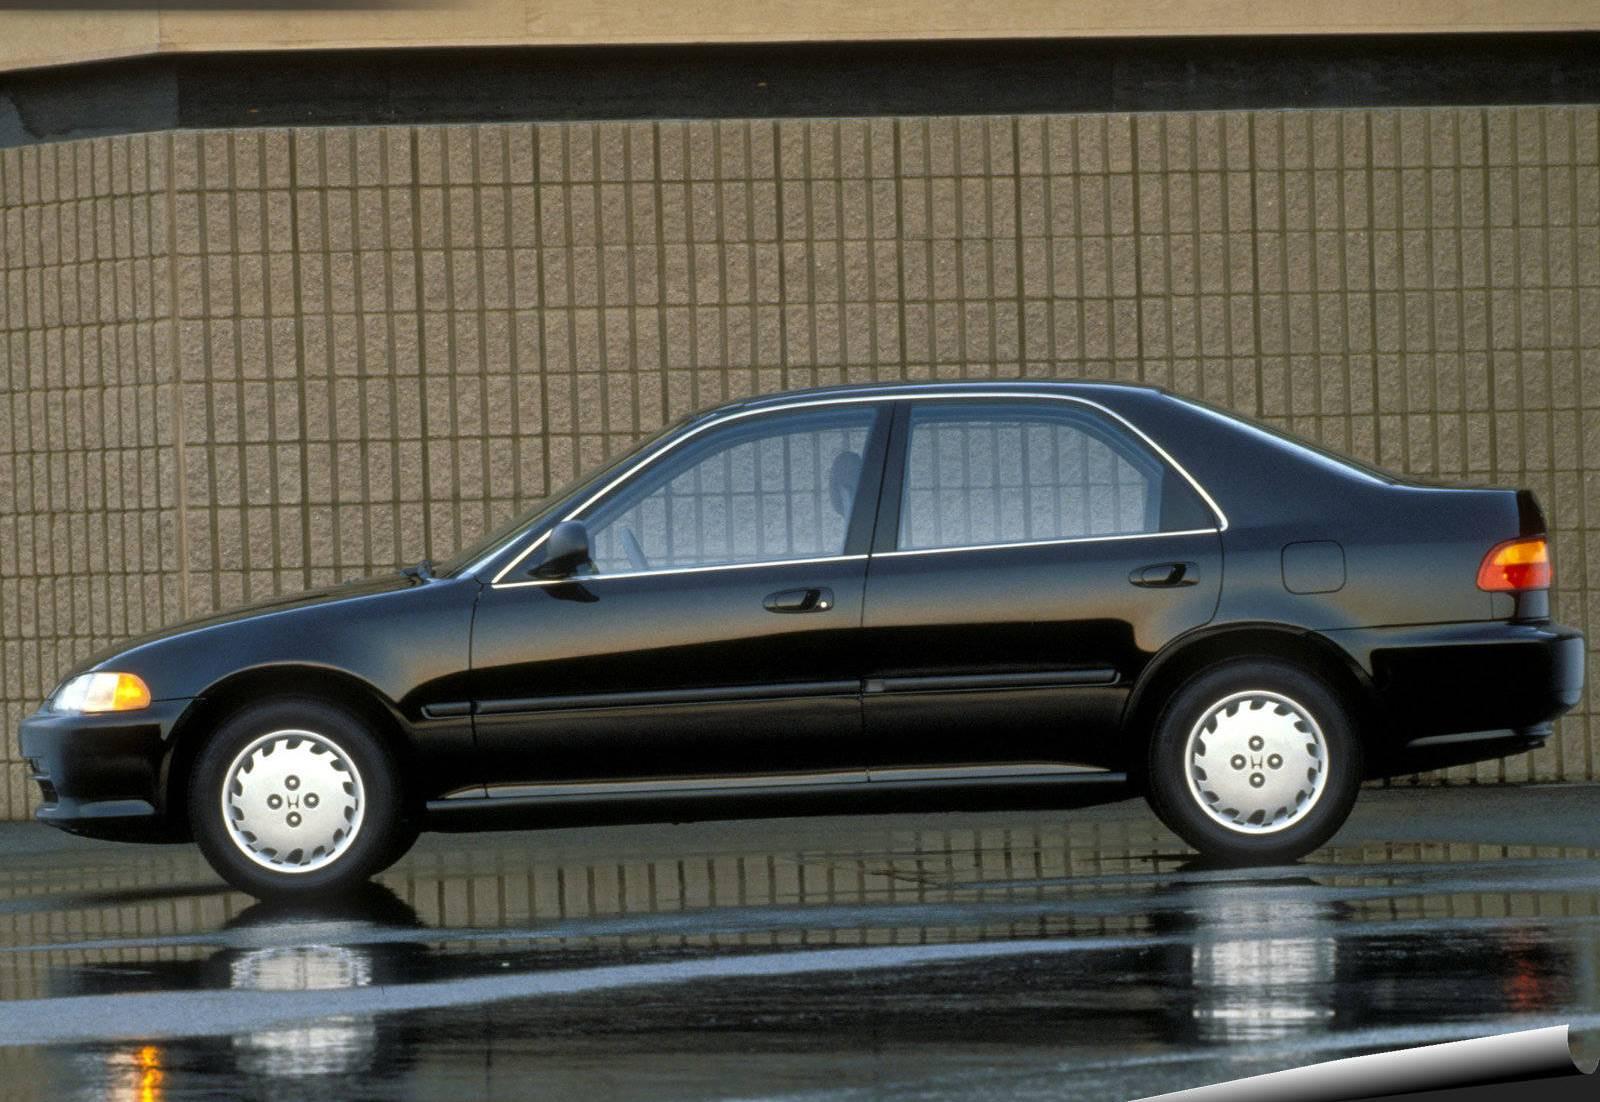 Honda Civic 1995 Exterior Side View